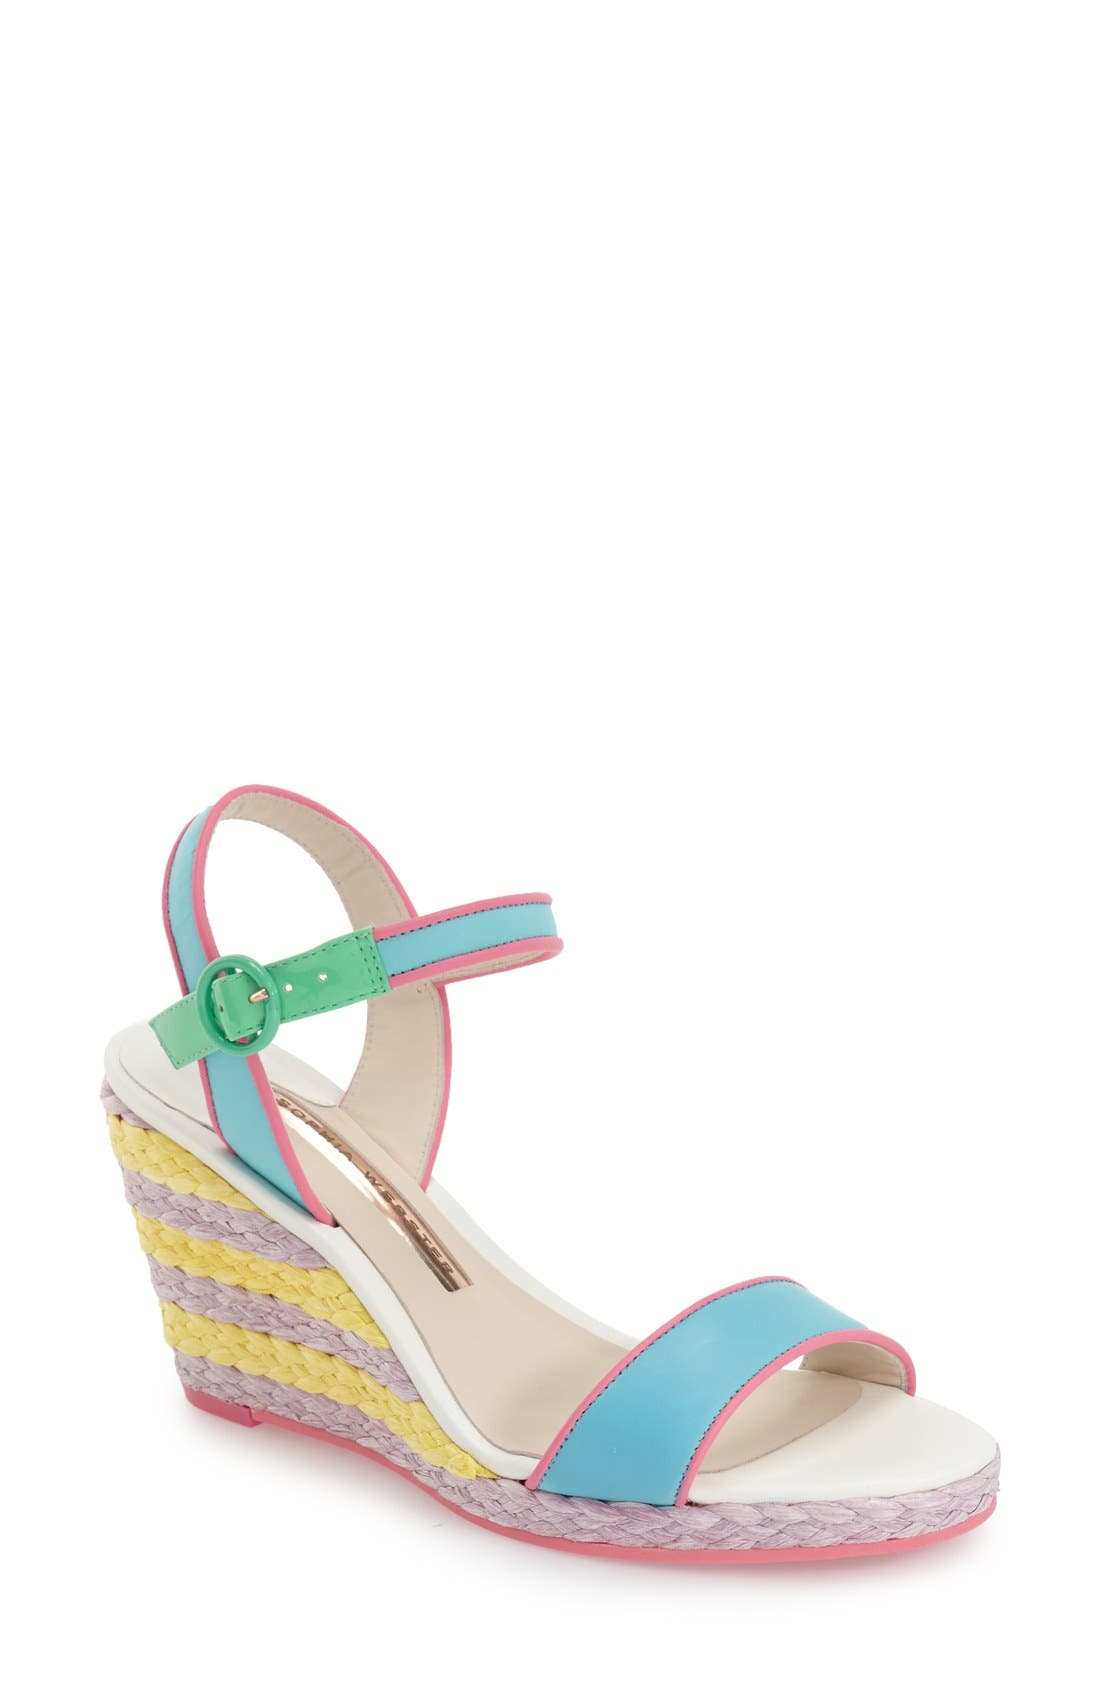 Alternate Image 1 Selected - Sophia Webster 'Lucita' Wedge Sandal (Women)